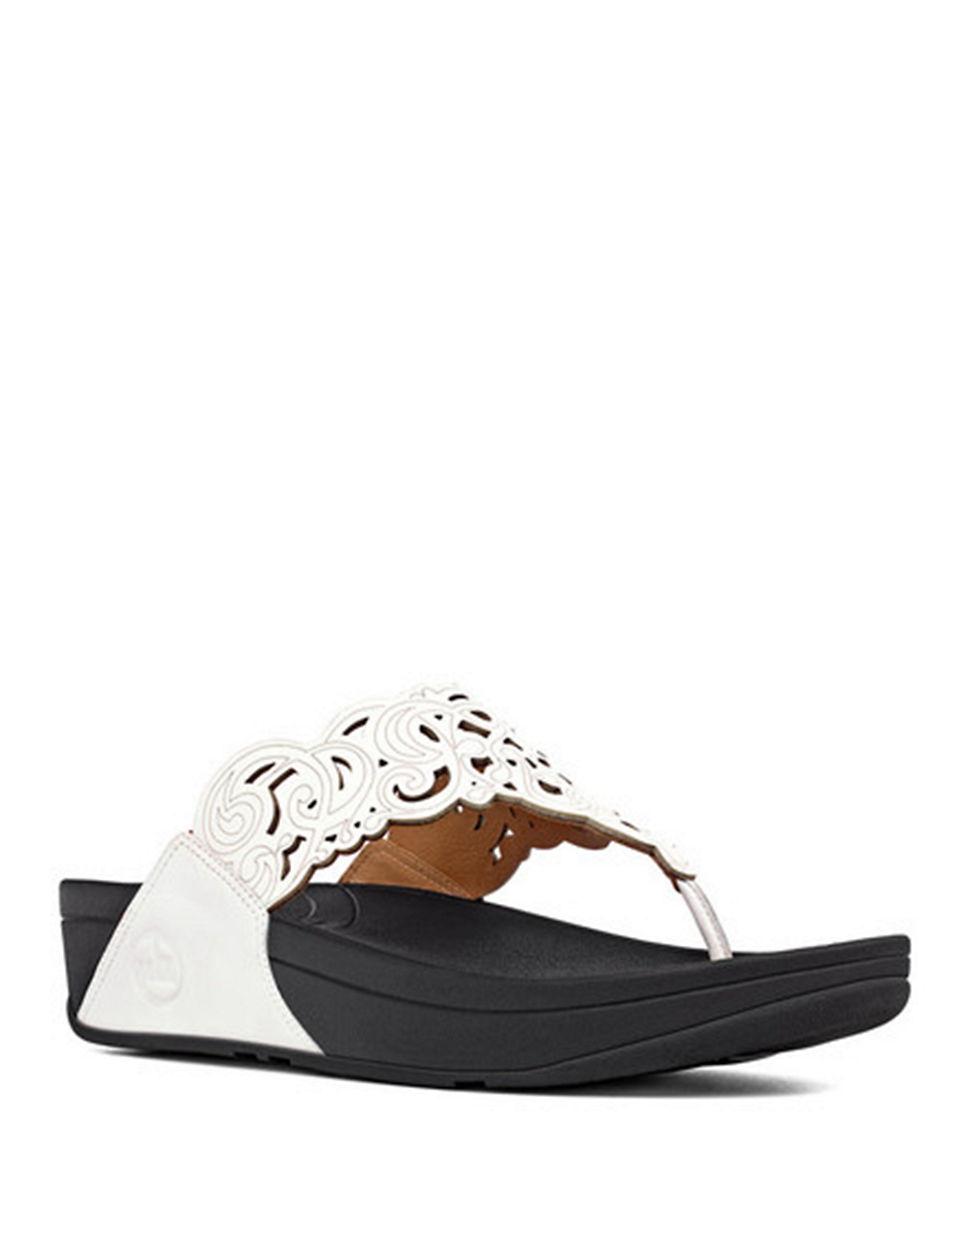 a0321263370e Fitflop Flora Thong Sandals